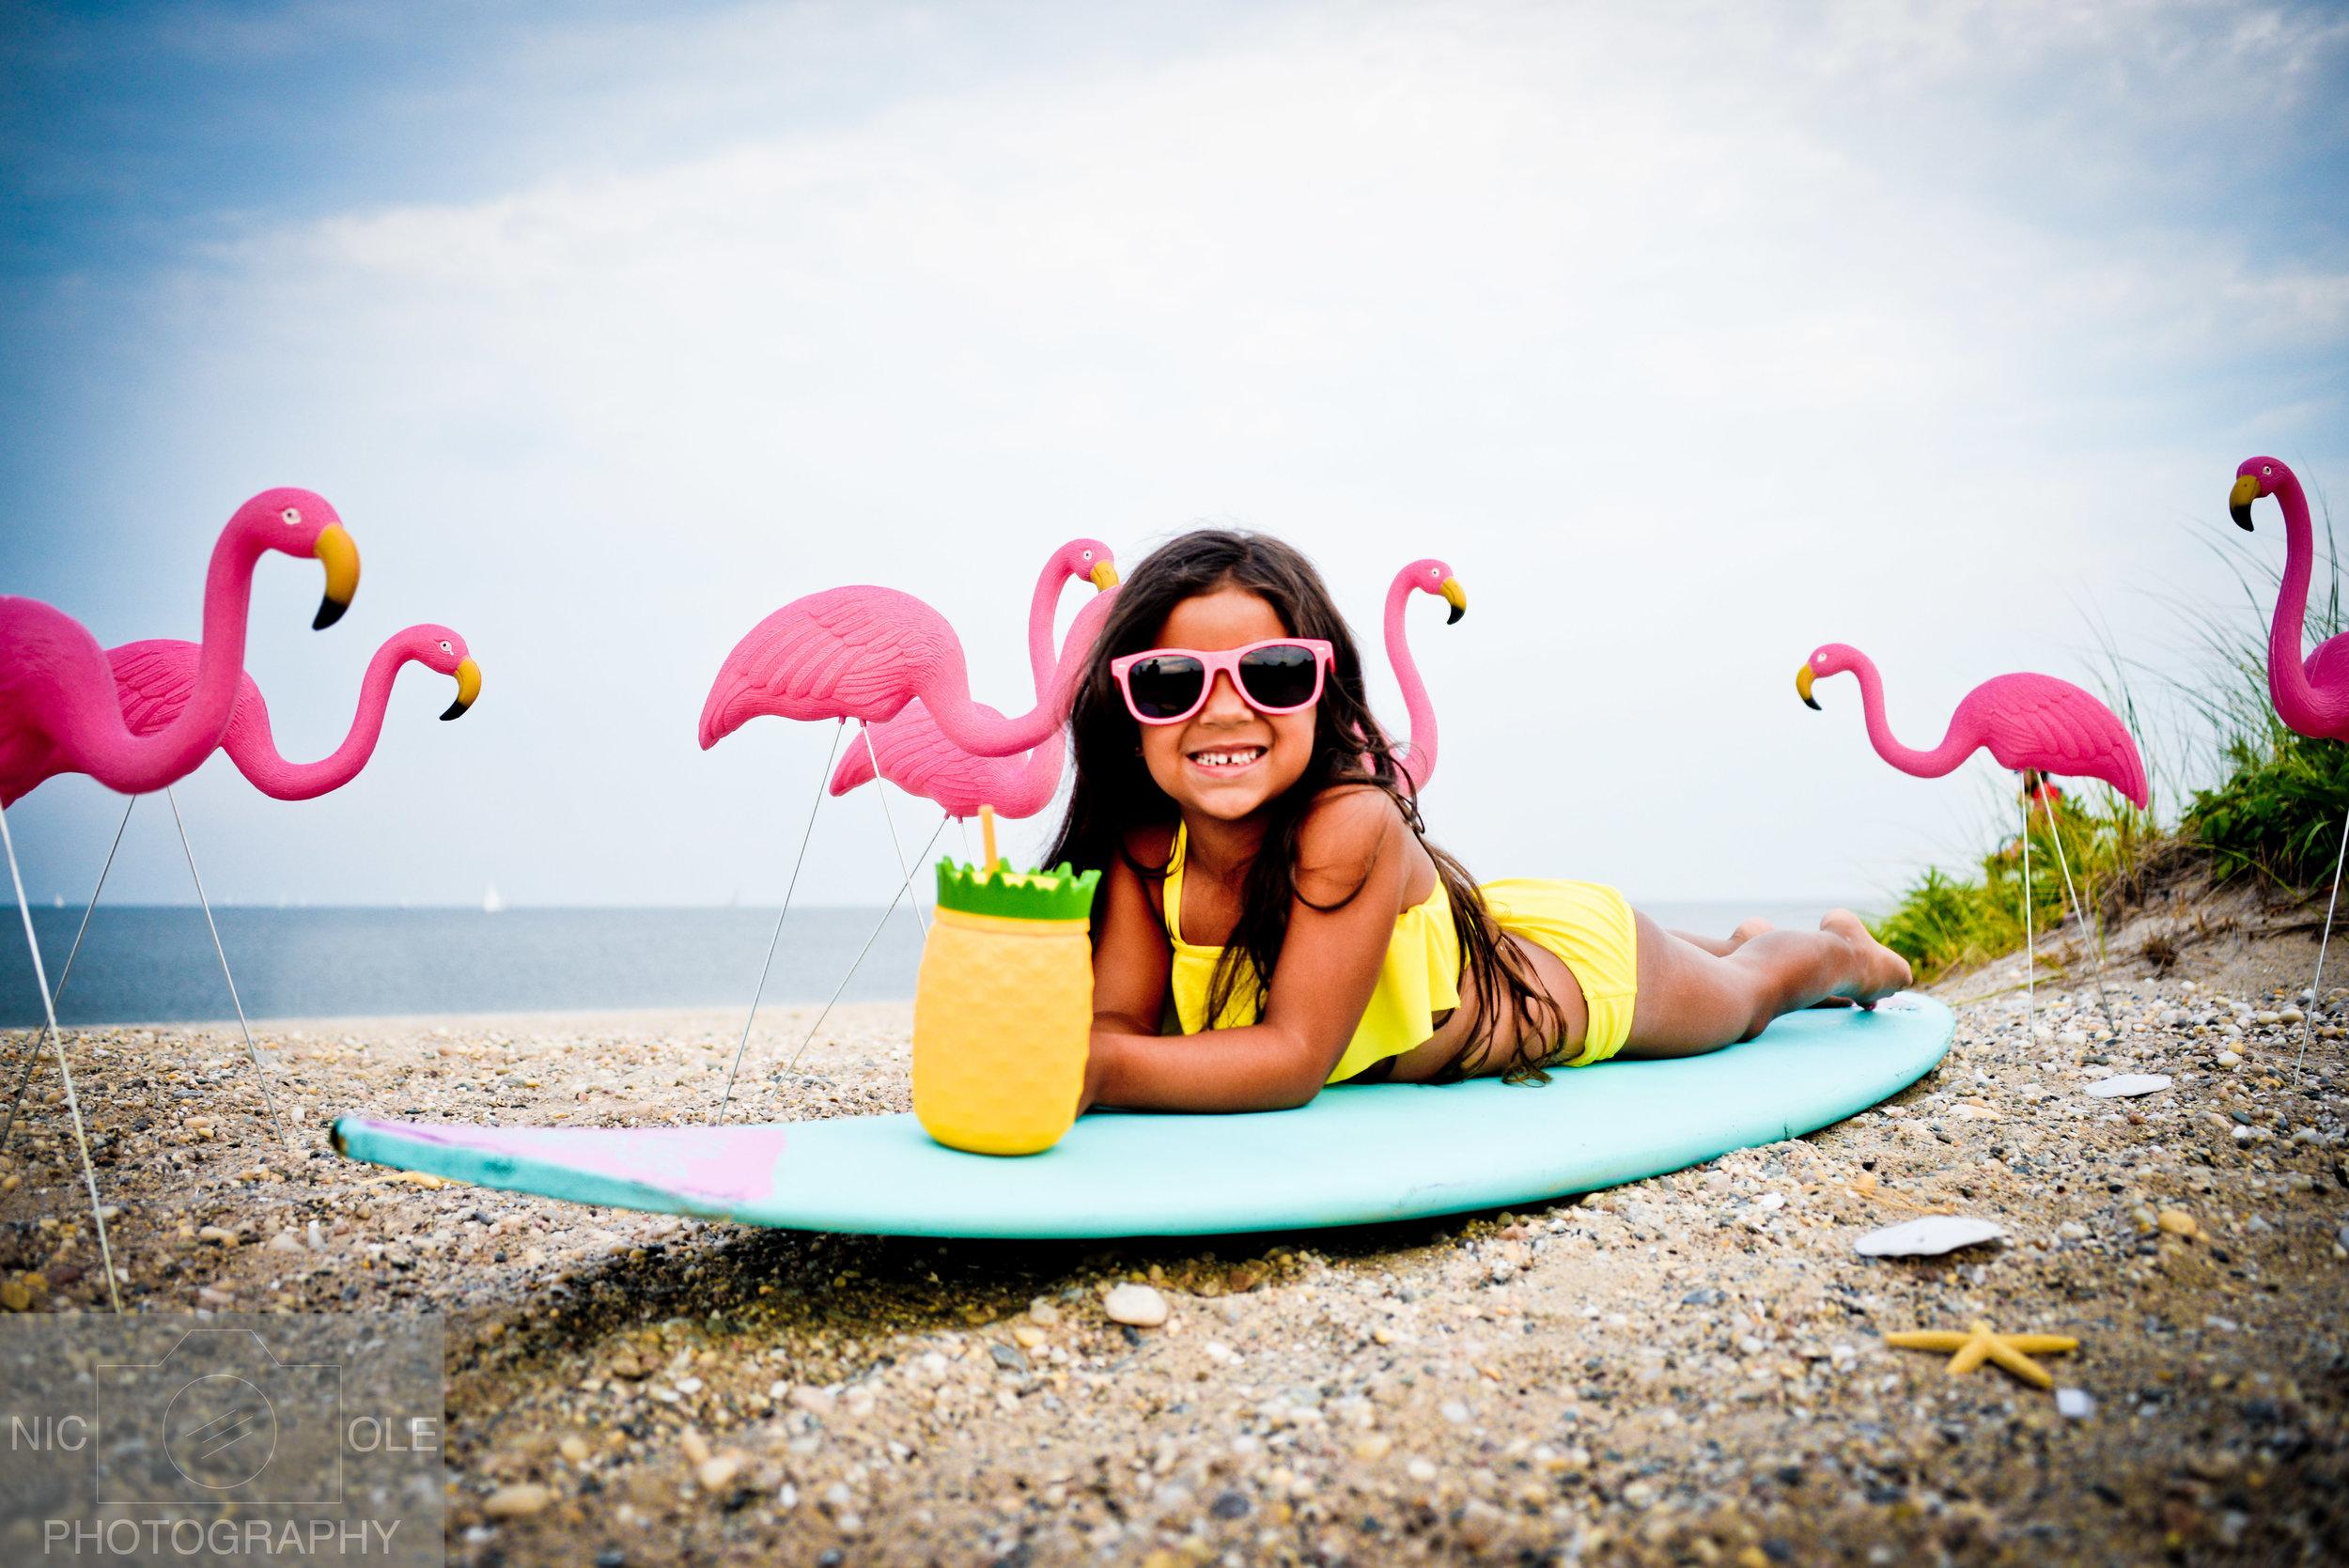 Cielo Noemi Flamingo Beach 7.20.17- NIC-OLE Photography-1.jpg